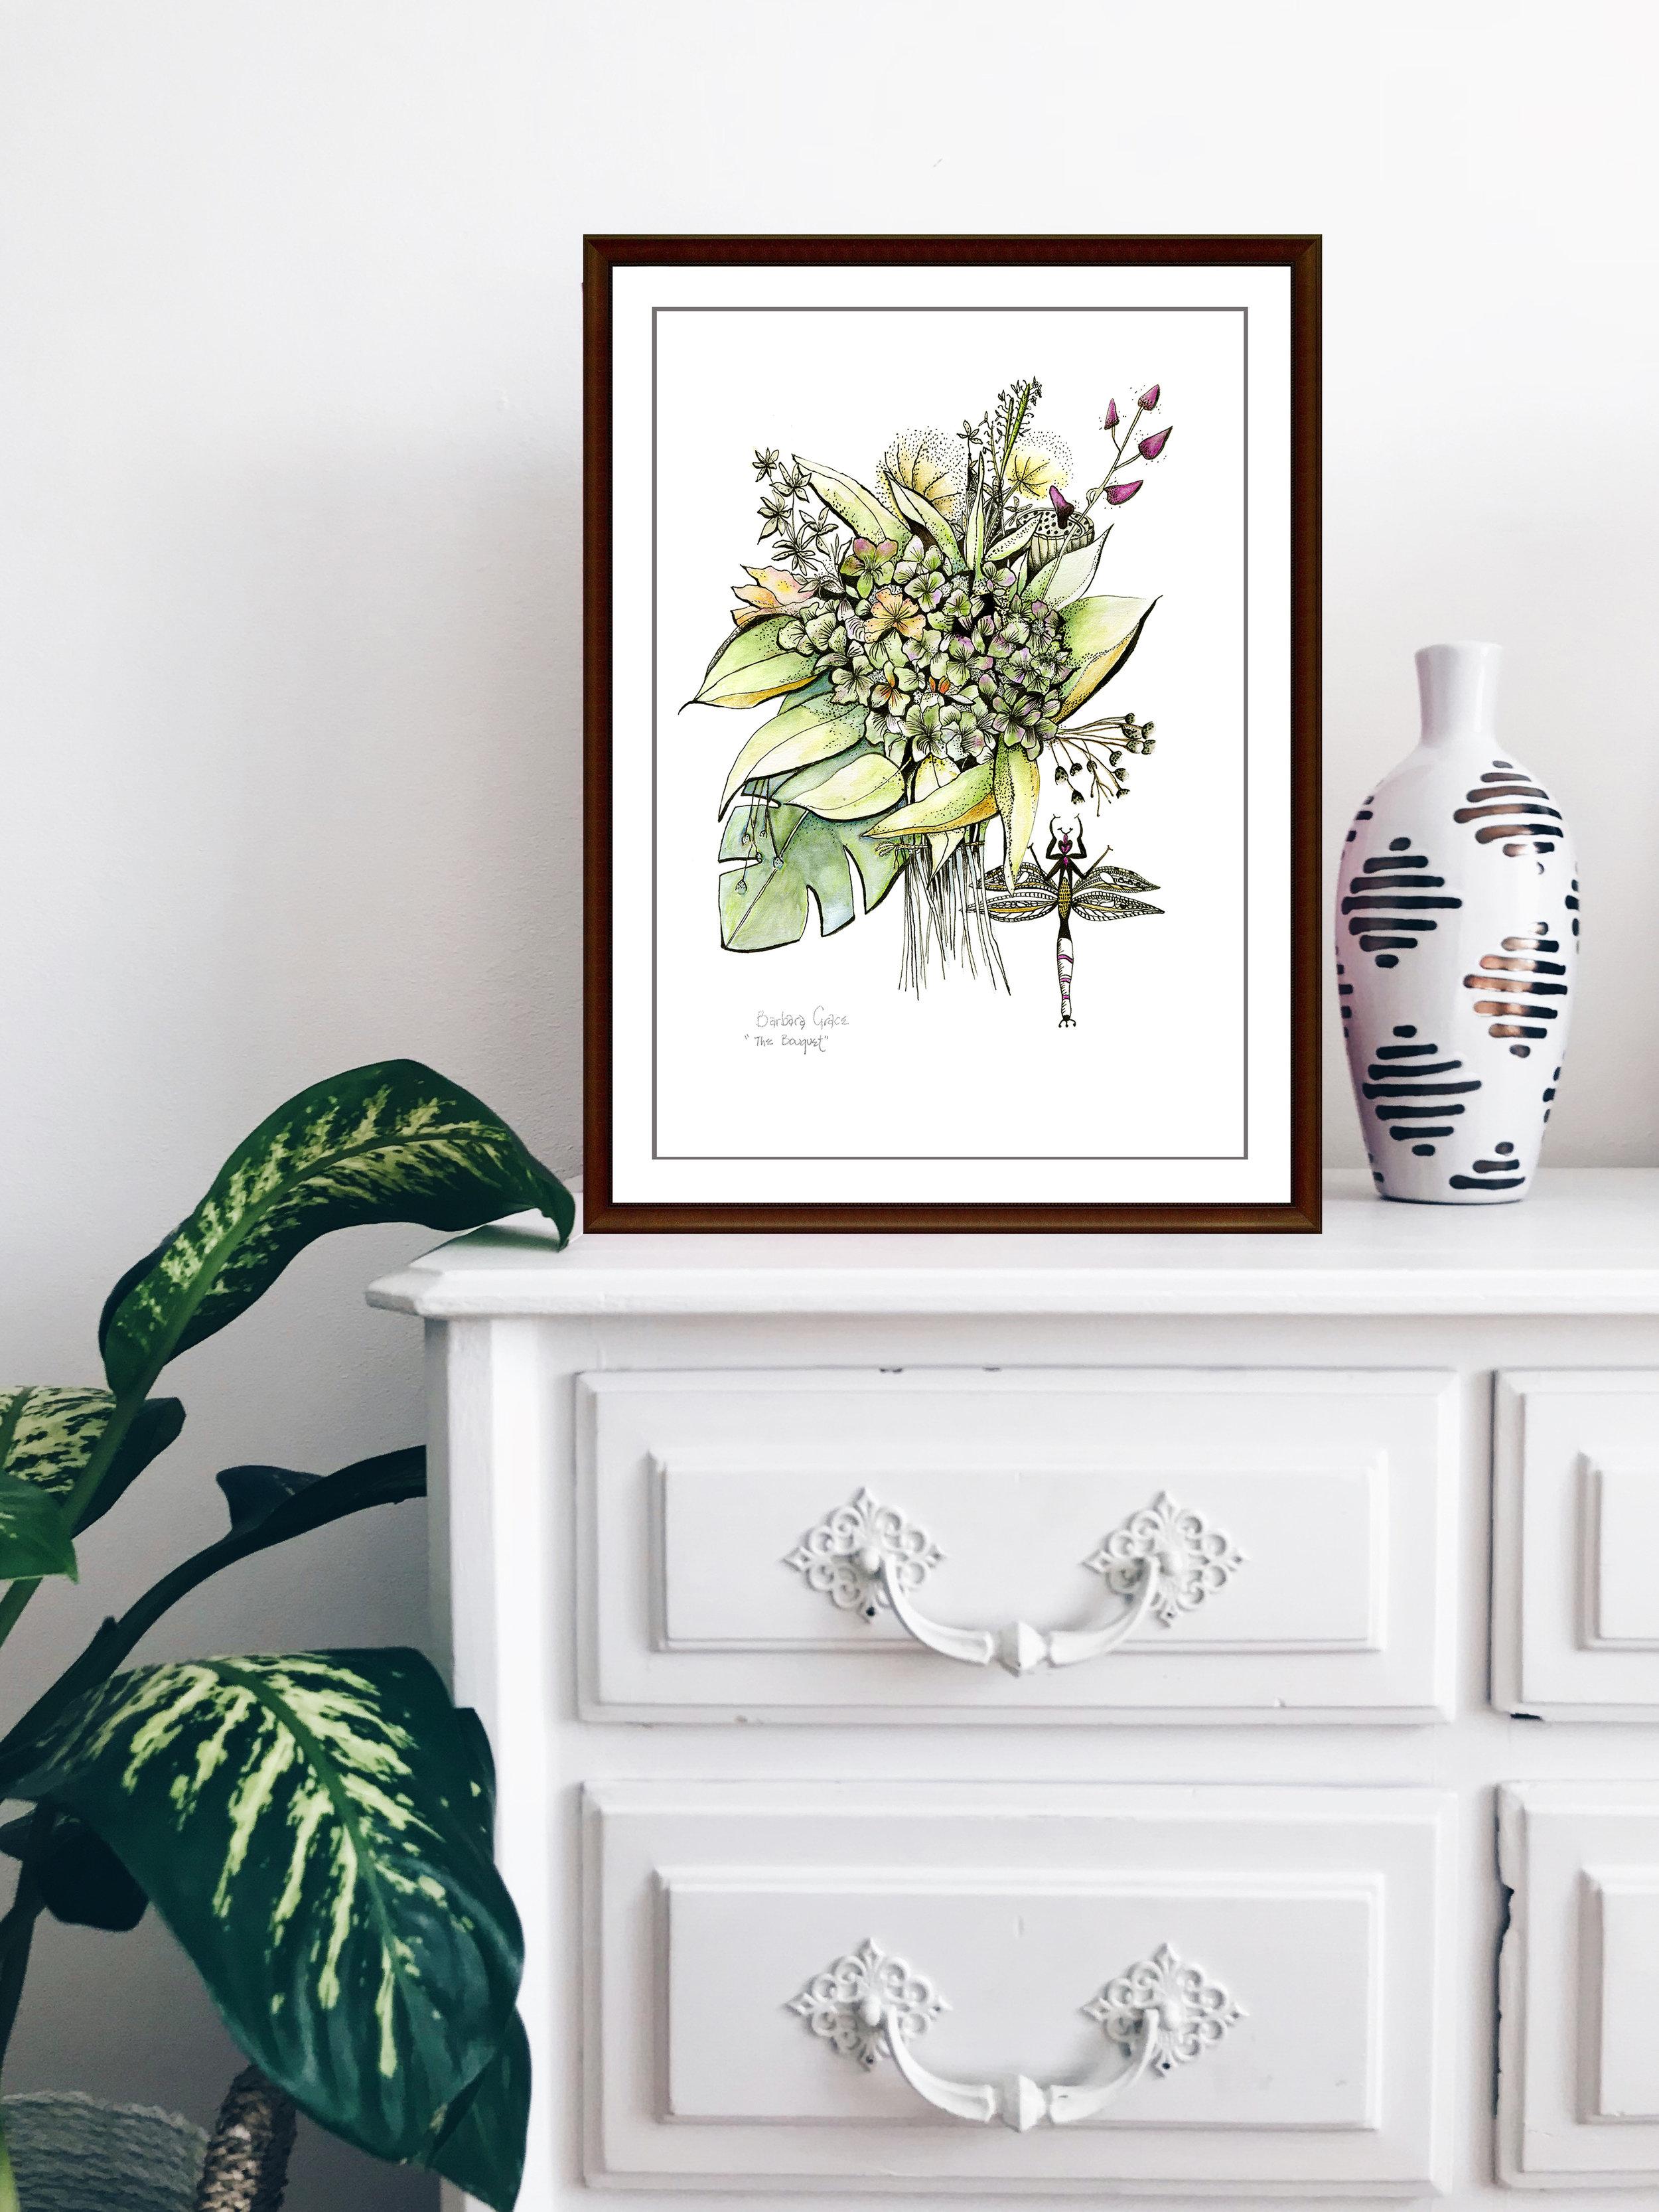 bouquet_ember-ivory-435461-unsplash.jpg